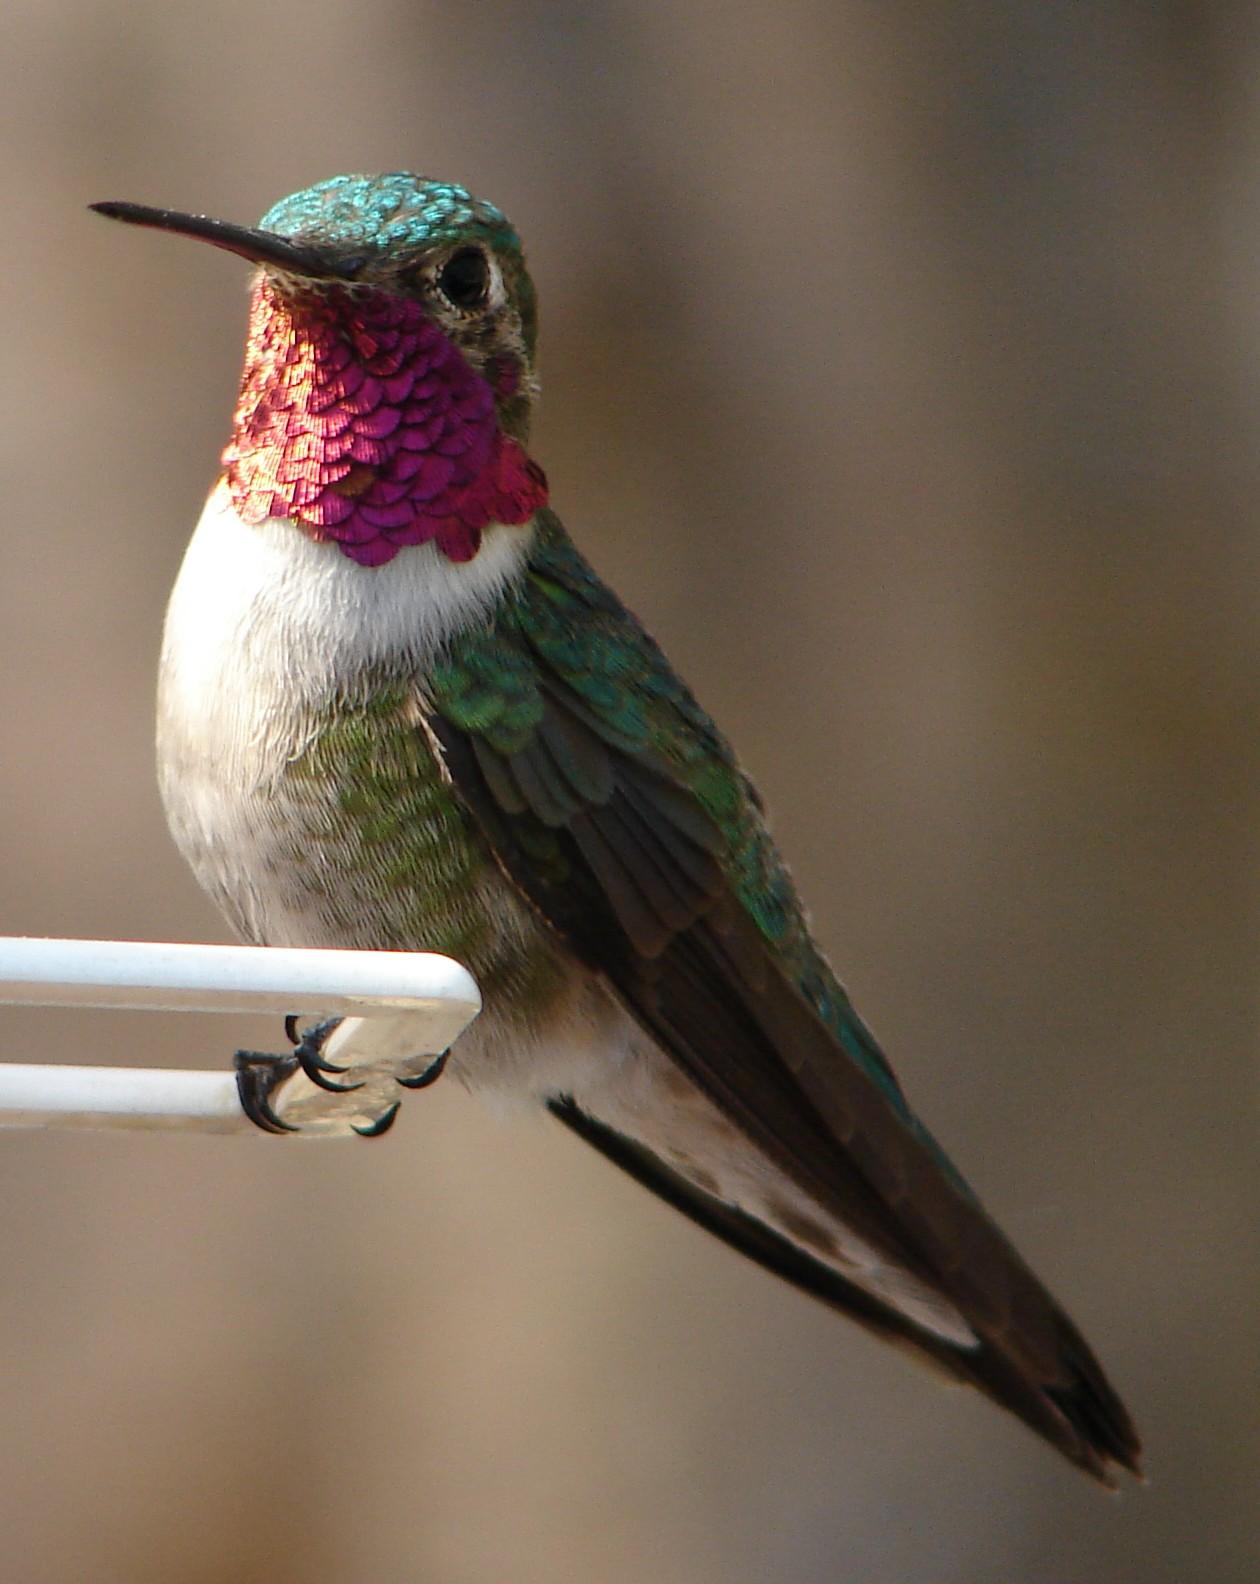 http://3.bp.blogspot.com/-SoVTEkoxh_c/Tmuli7-6IrI/AAAAAAAATiE/FIp8IL9orJs/s1600/Male_Ruby-Throated_Hummingbird.jpg